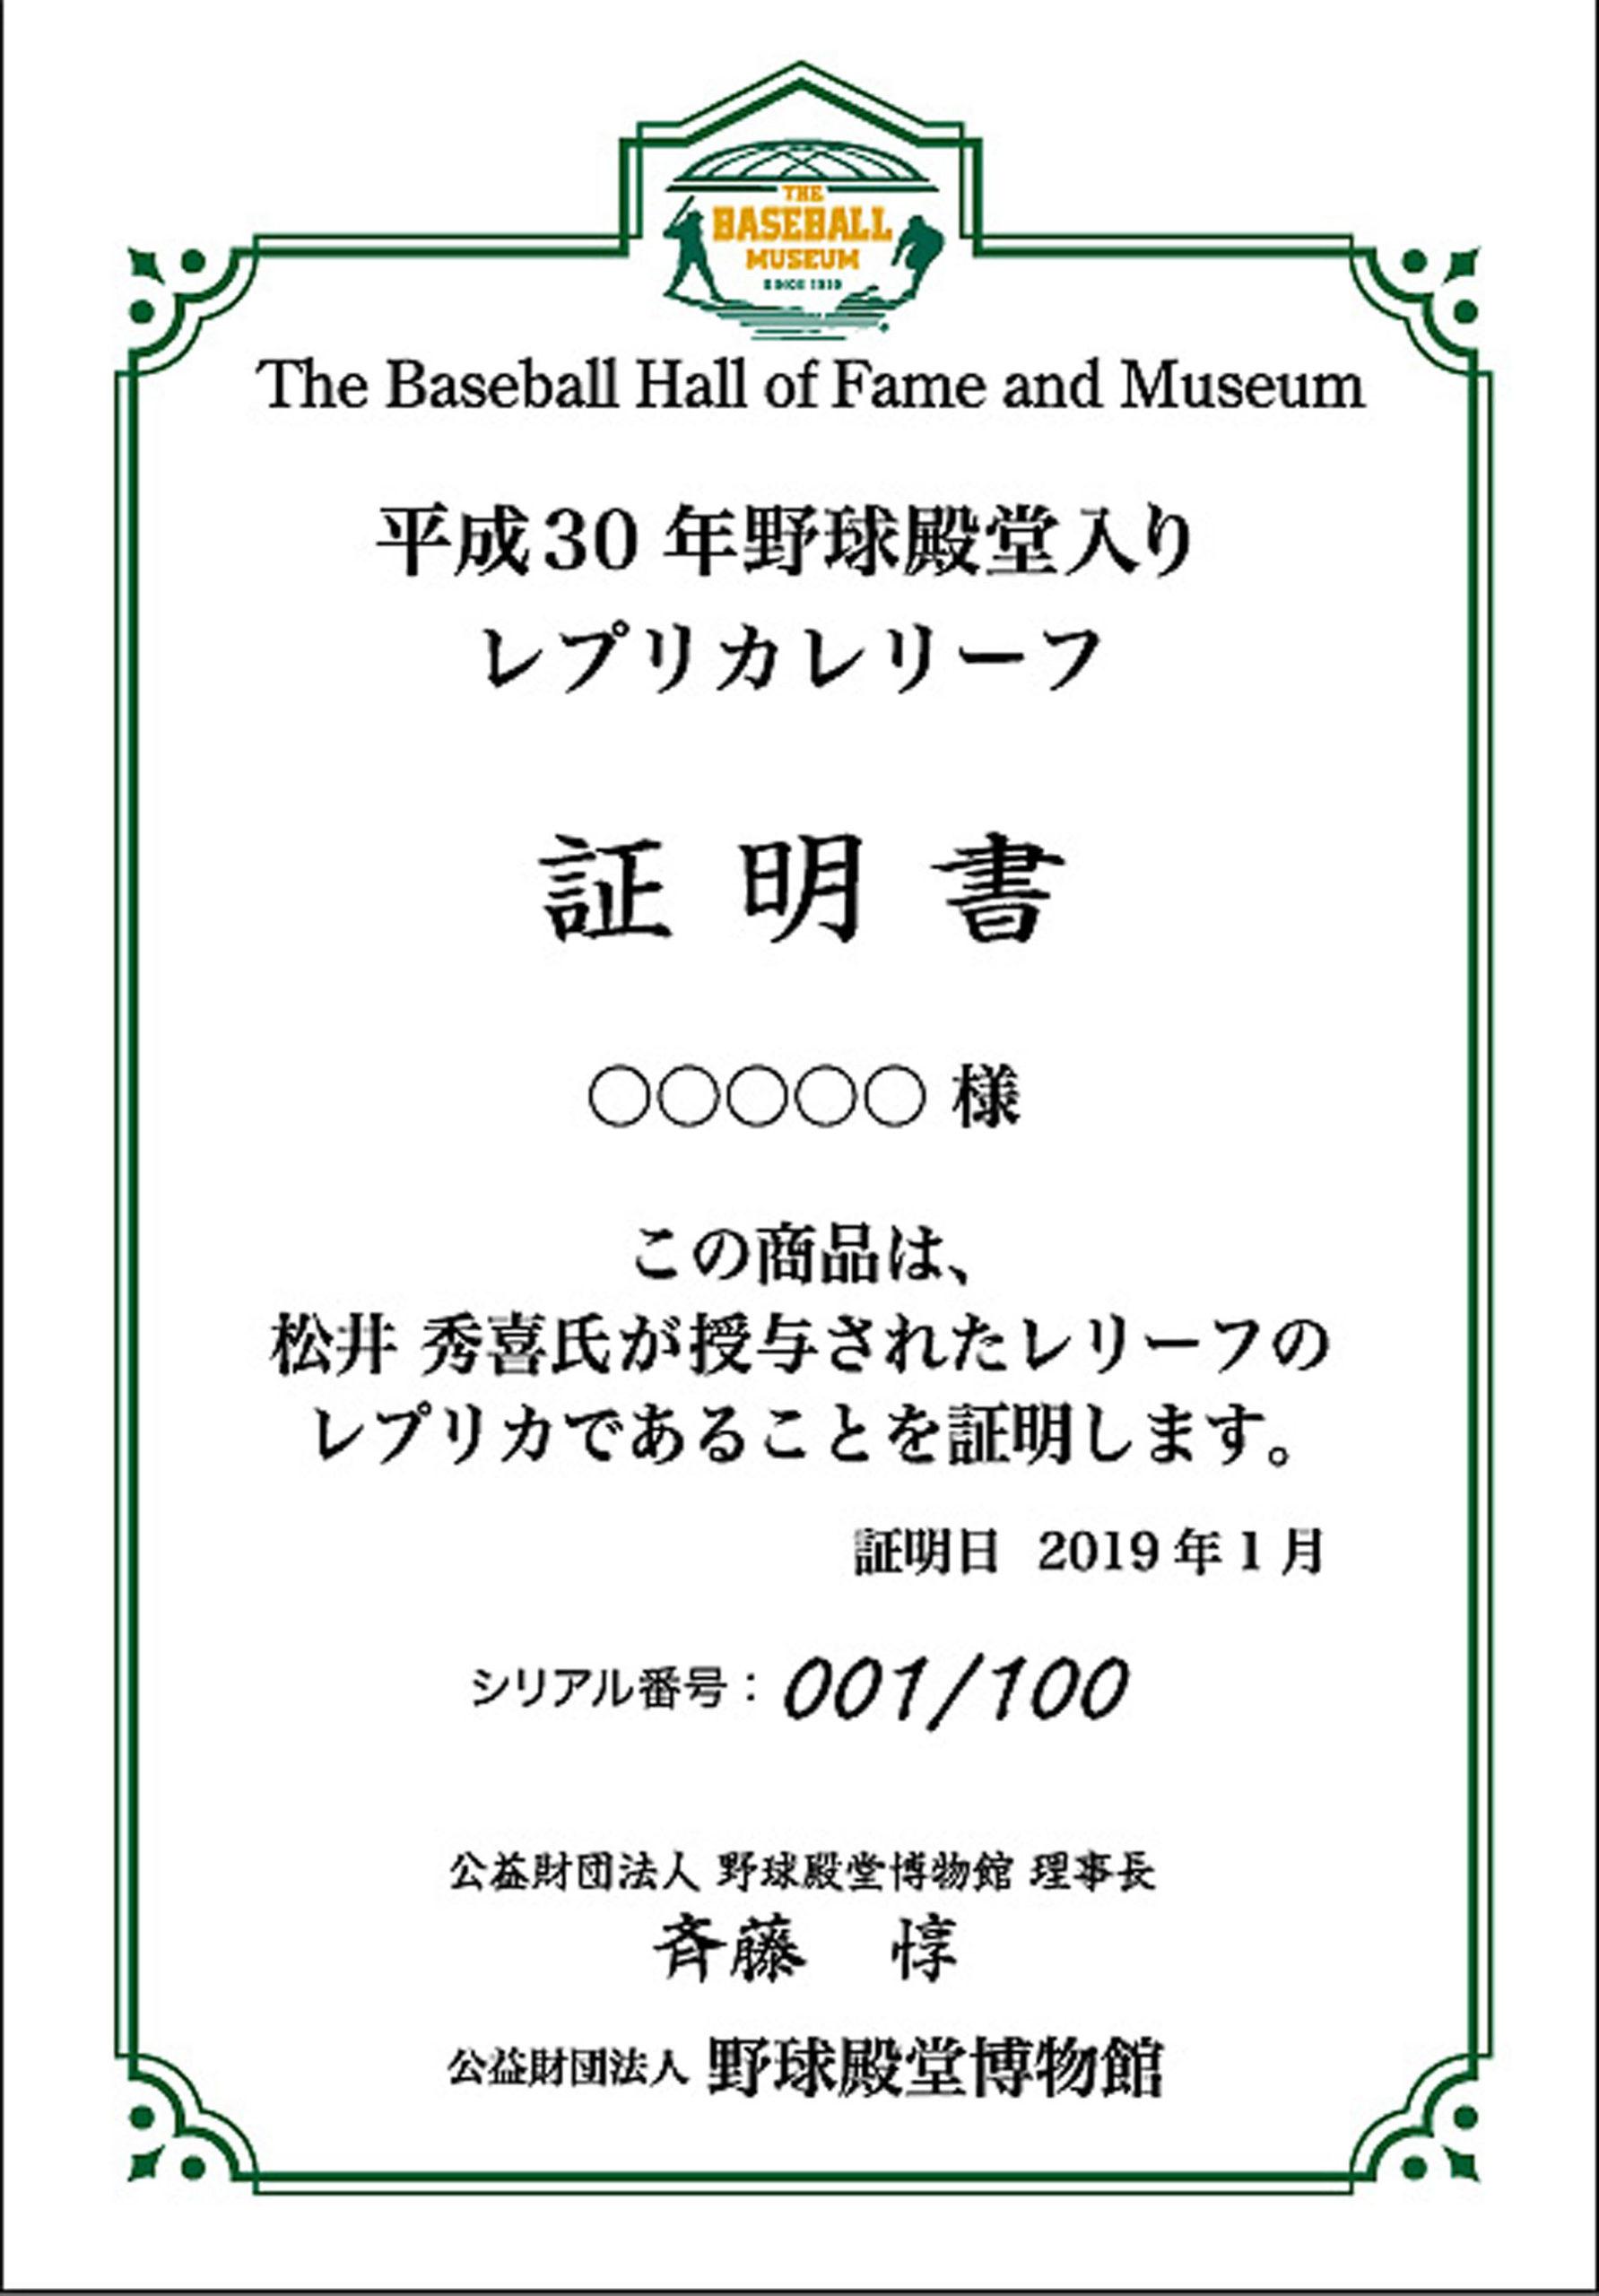 sp-museum-replica-matsui